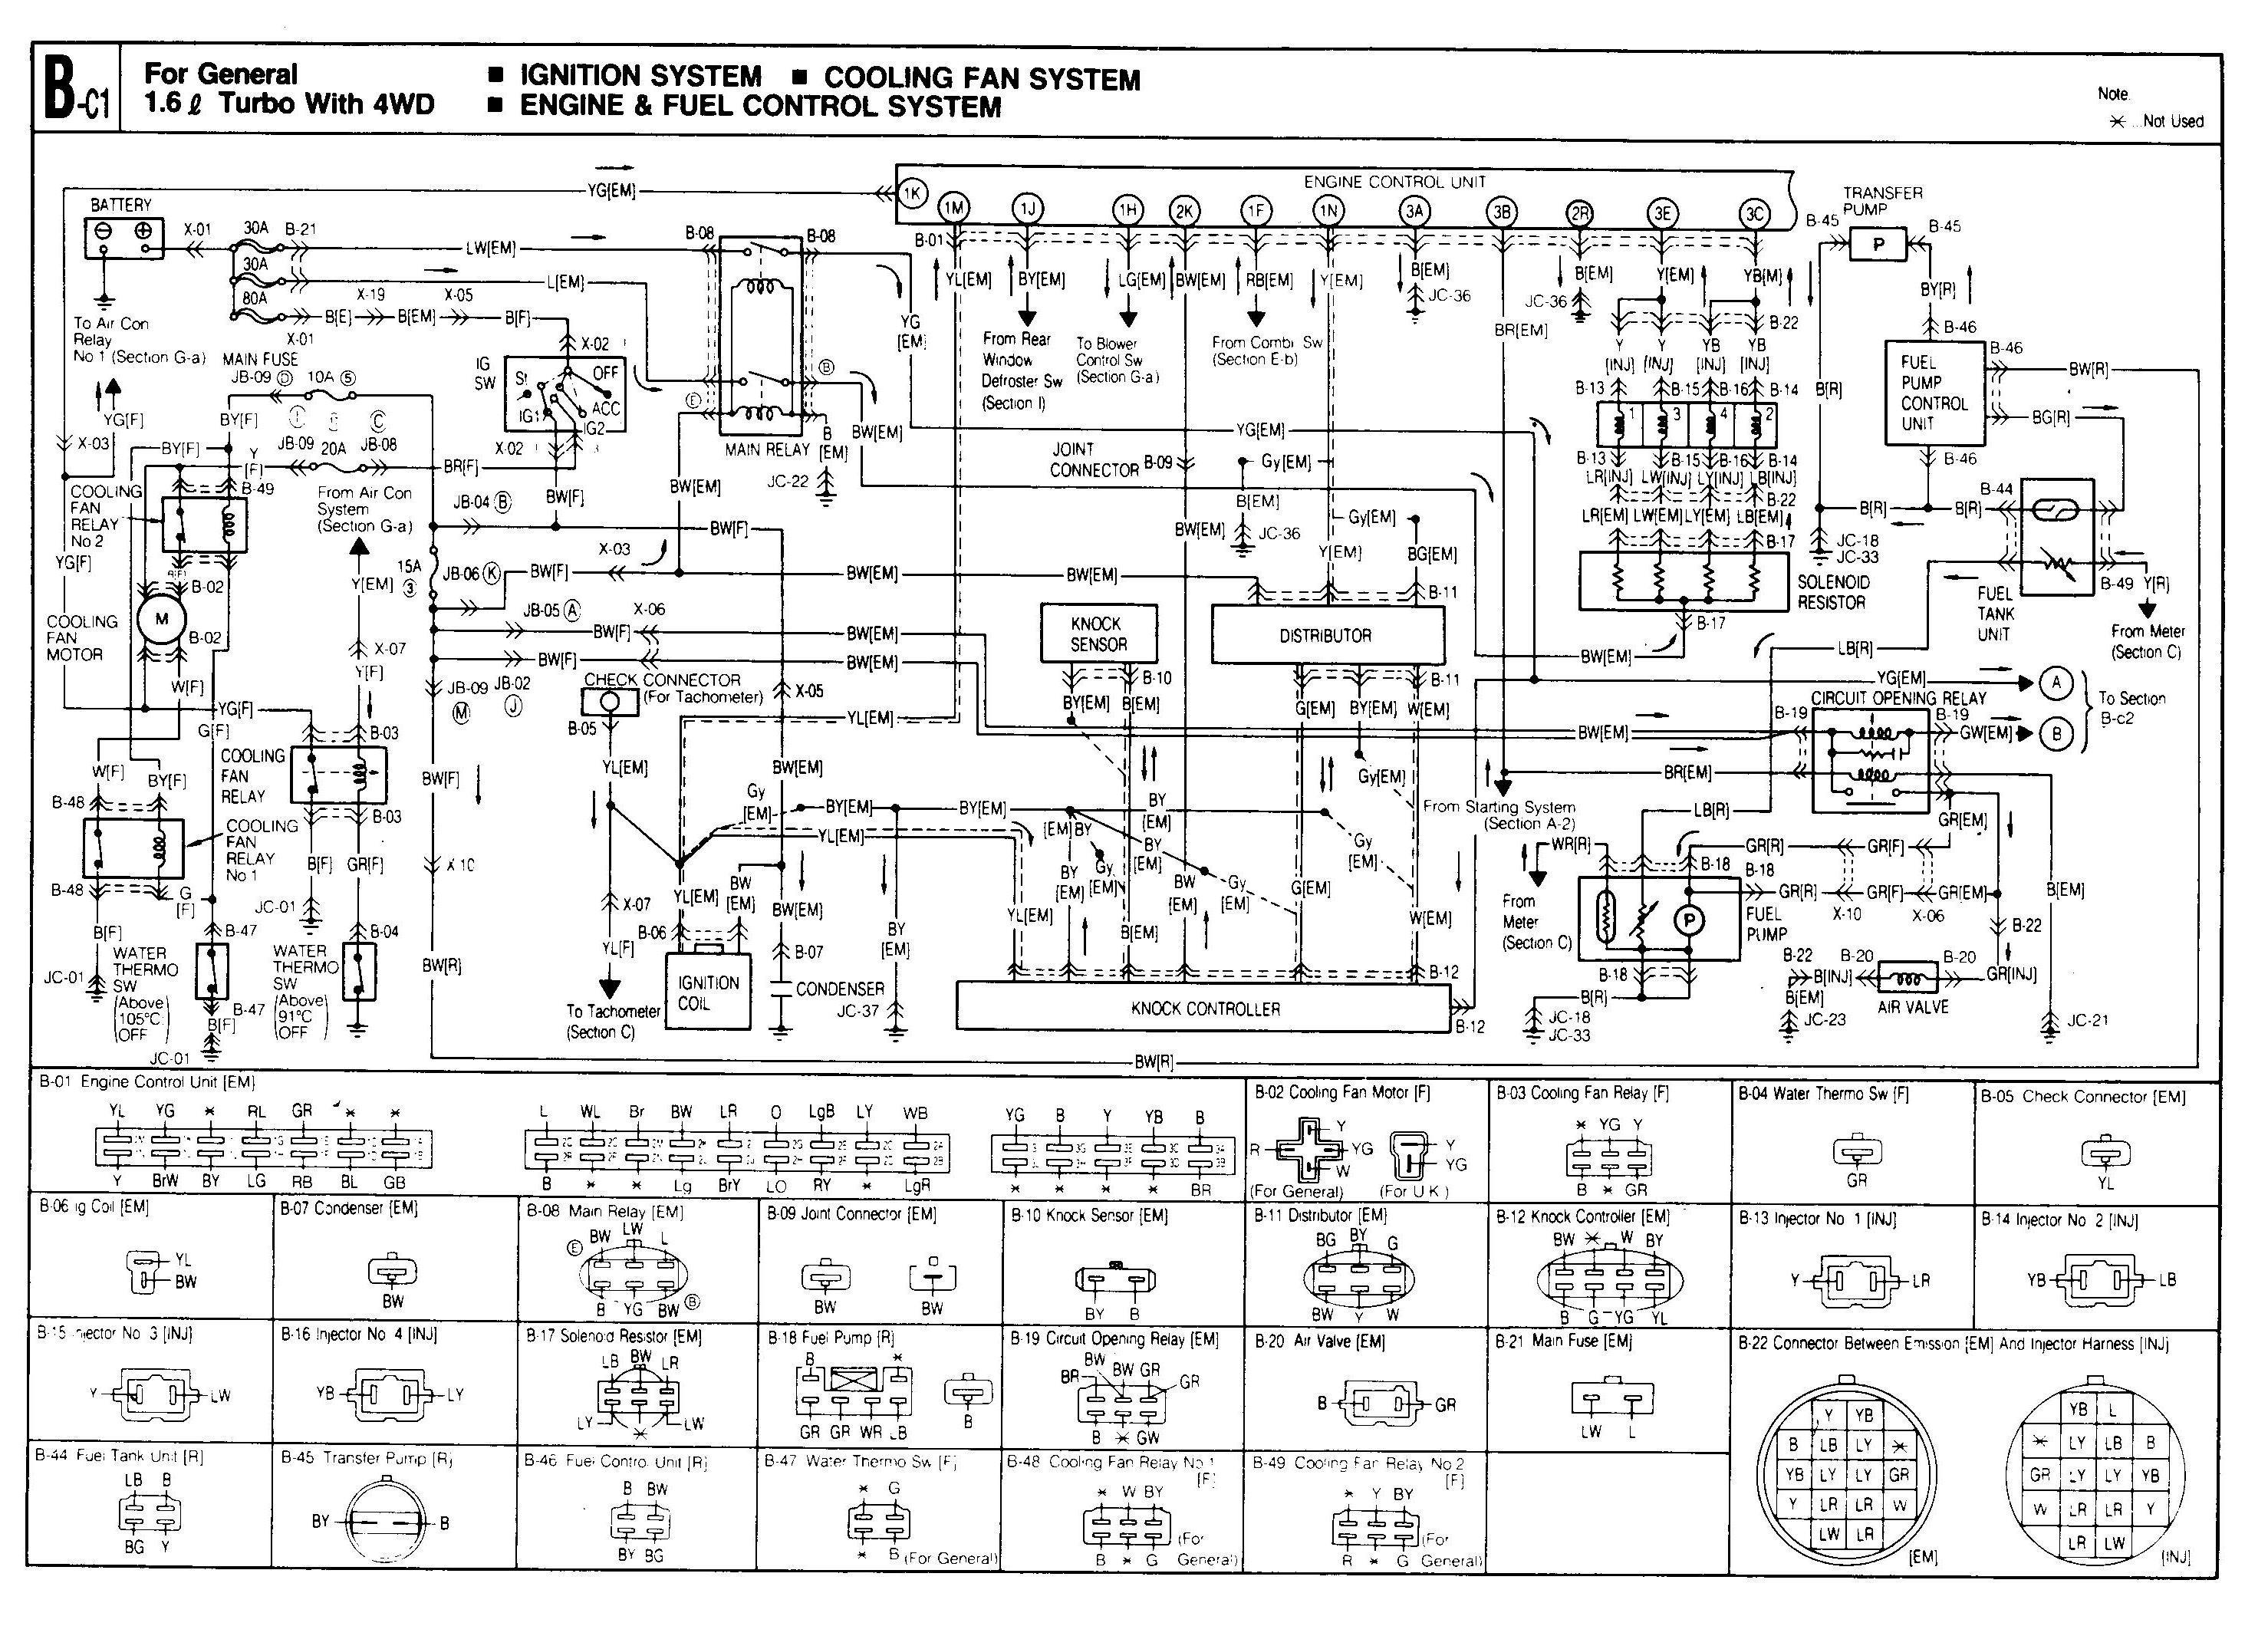 2000 Mazda Protege Engine Diagram Mazda Protege Hvac System Wiring Diagram Worksheet and Wiring Of 2000 Mazda Protege Engine Diagram